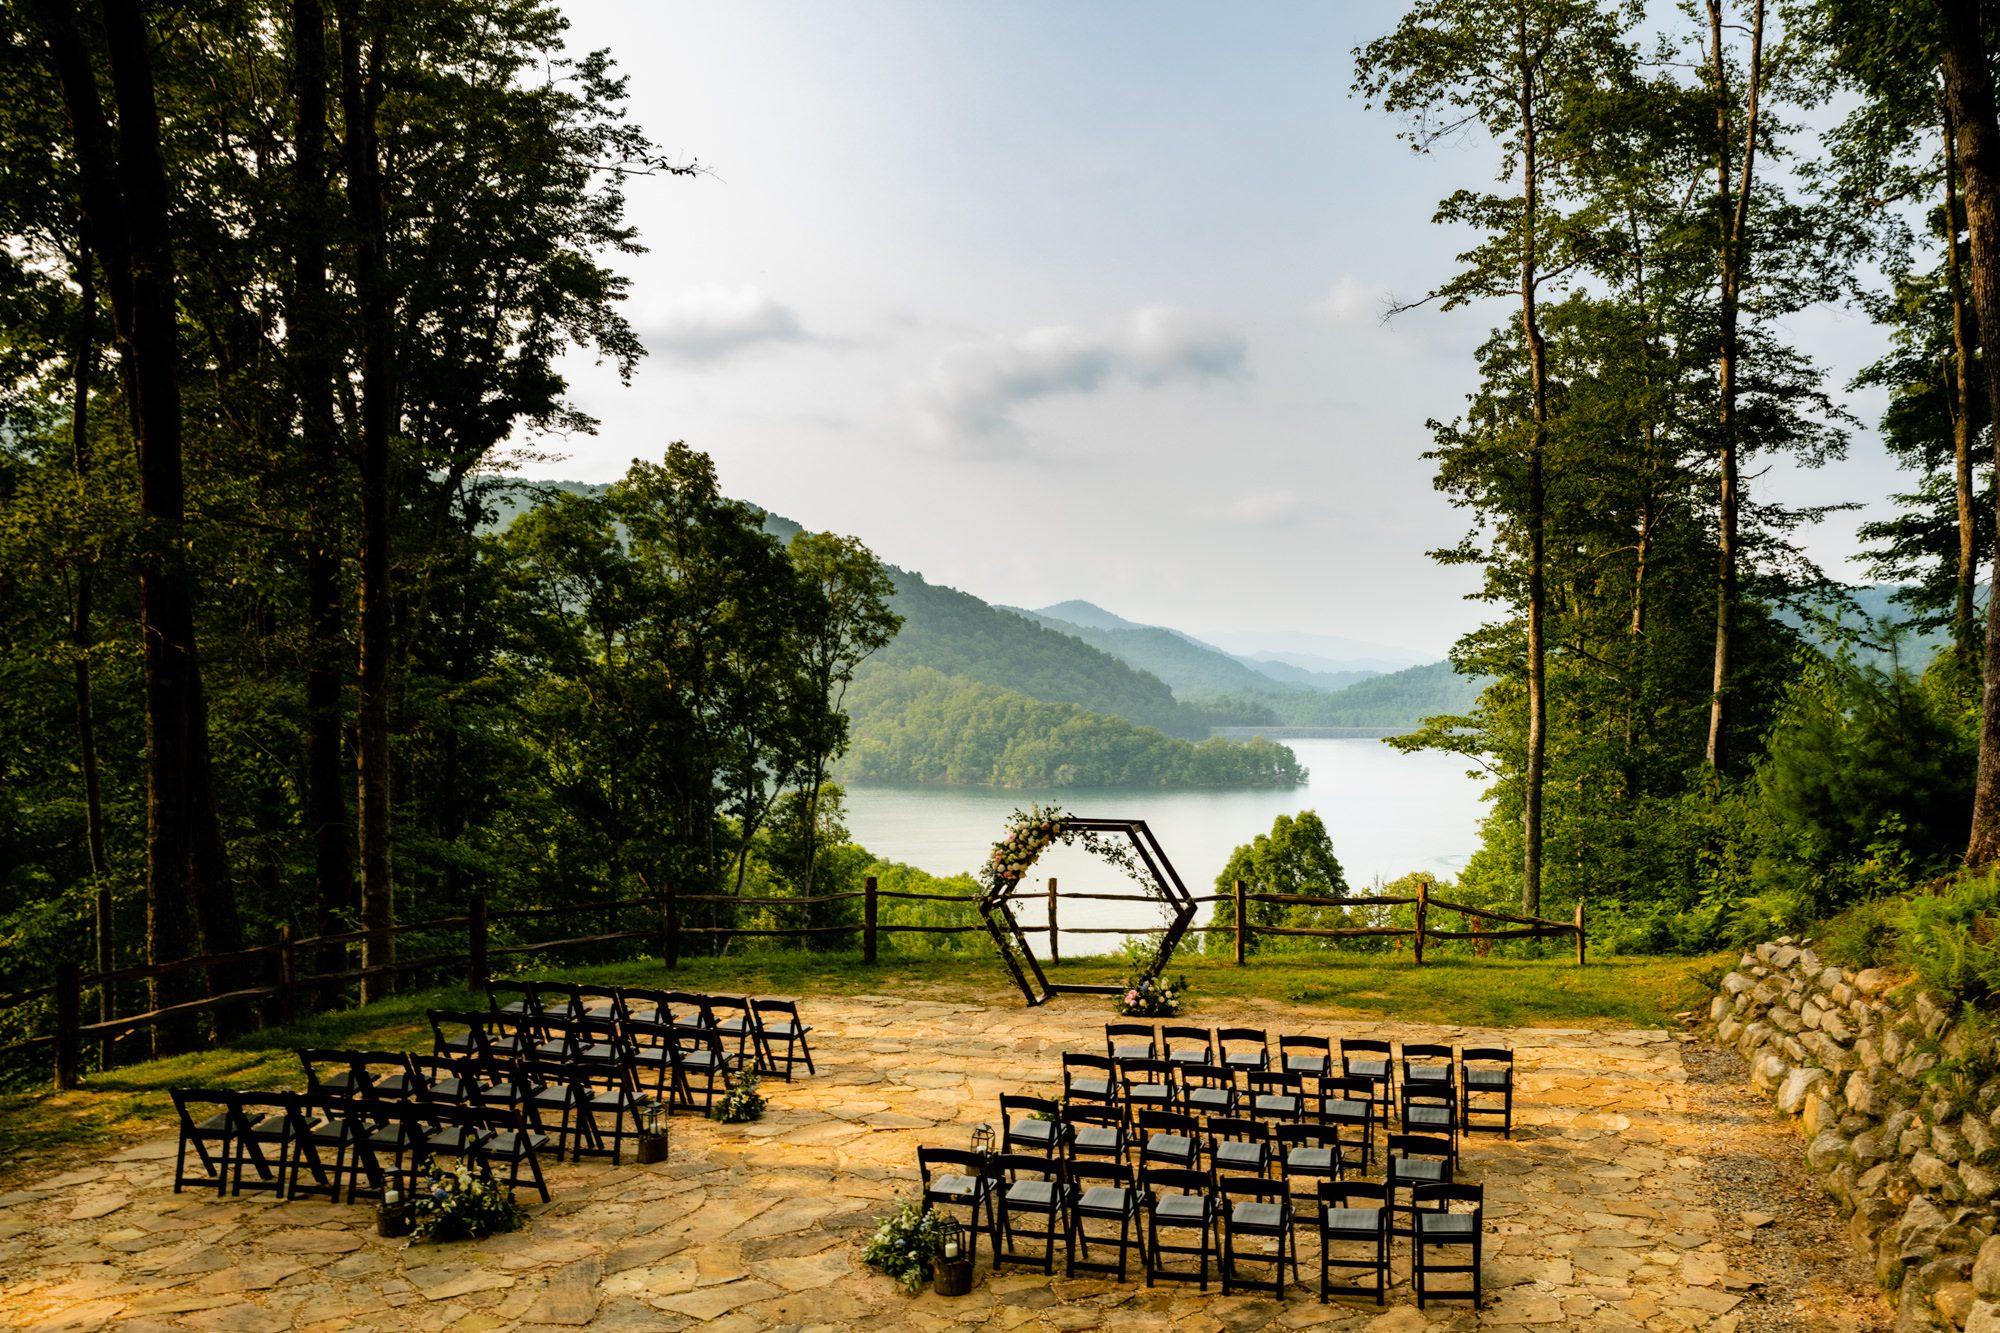 wedding ceremony venue setup at Nantahala weddings and events